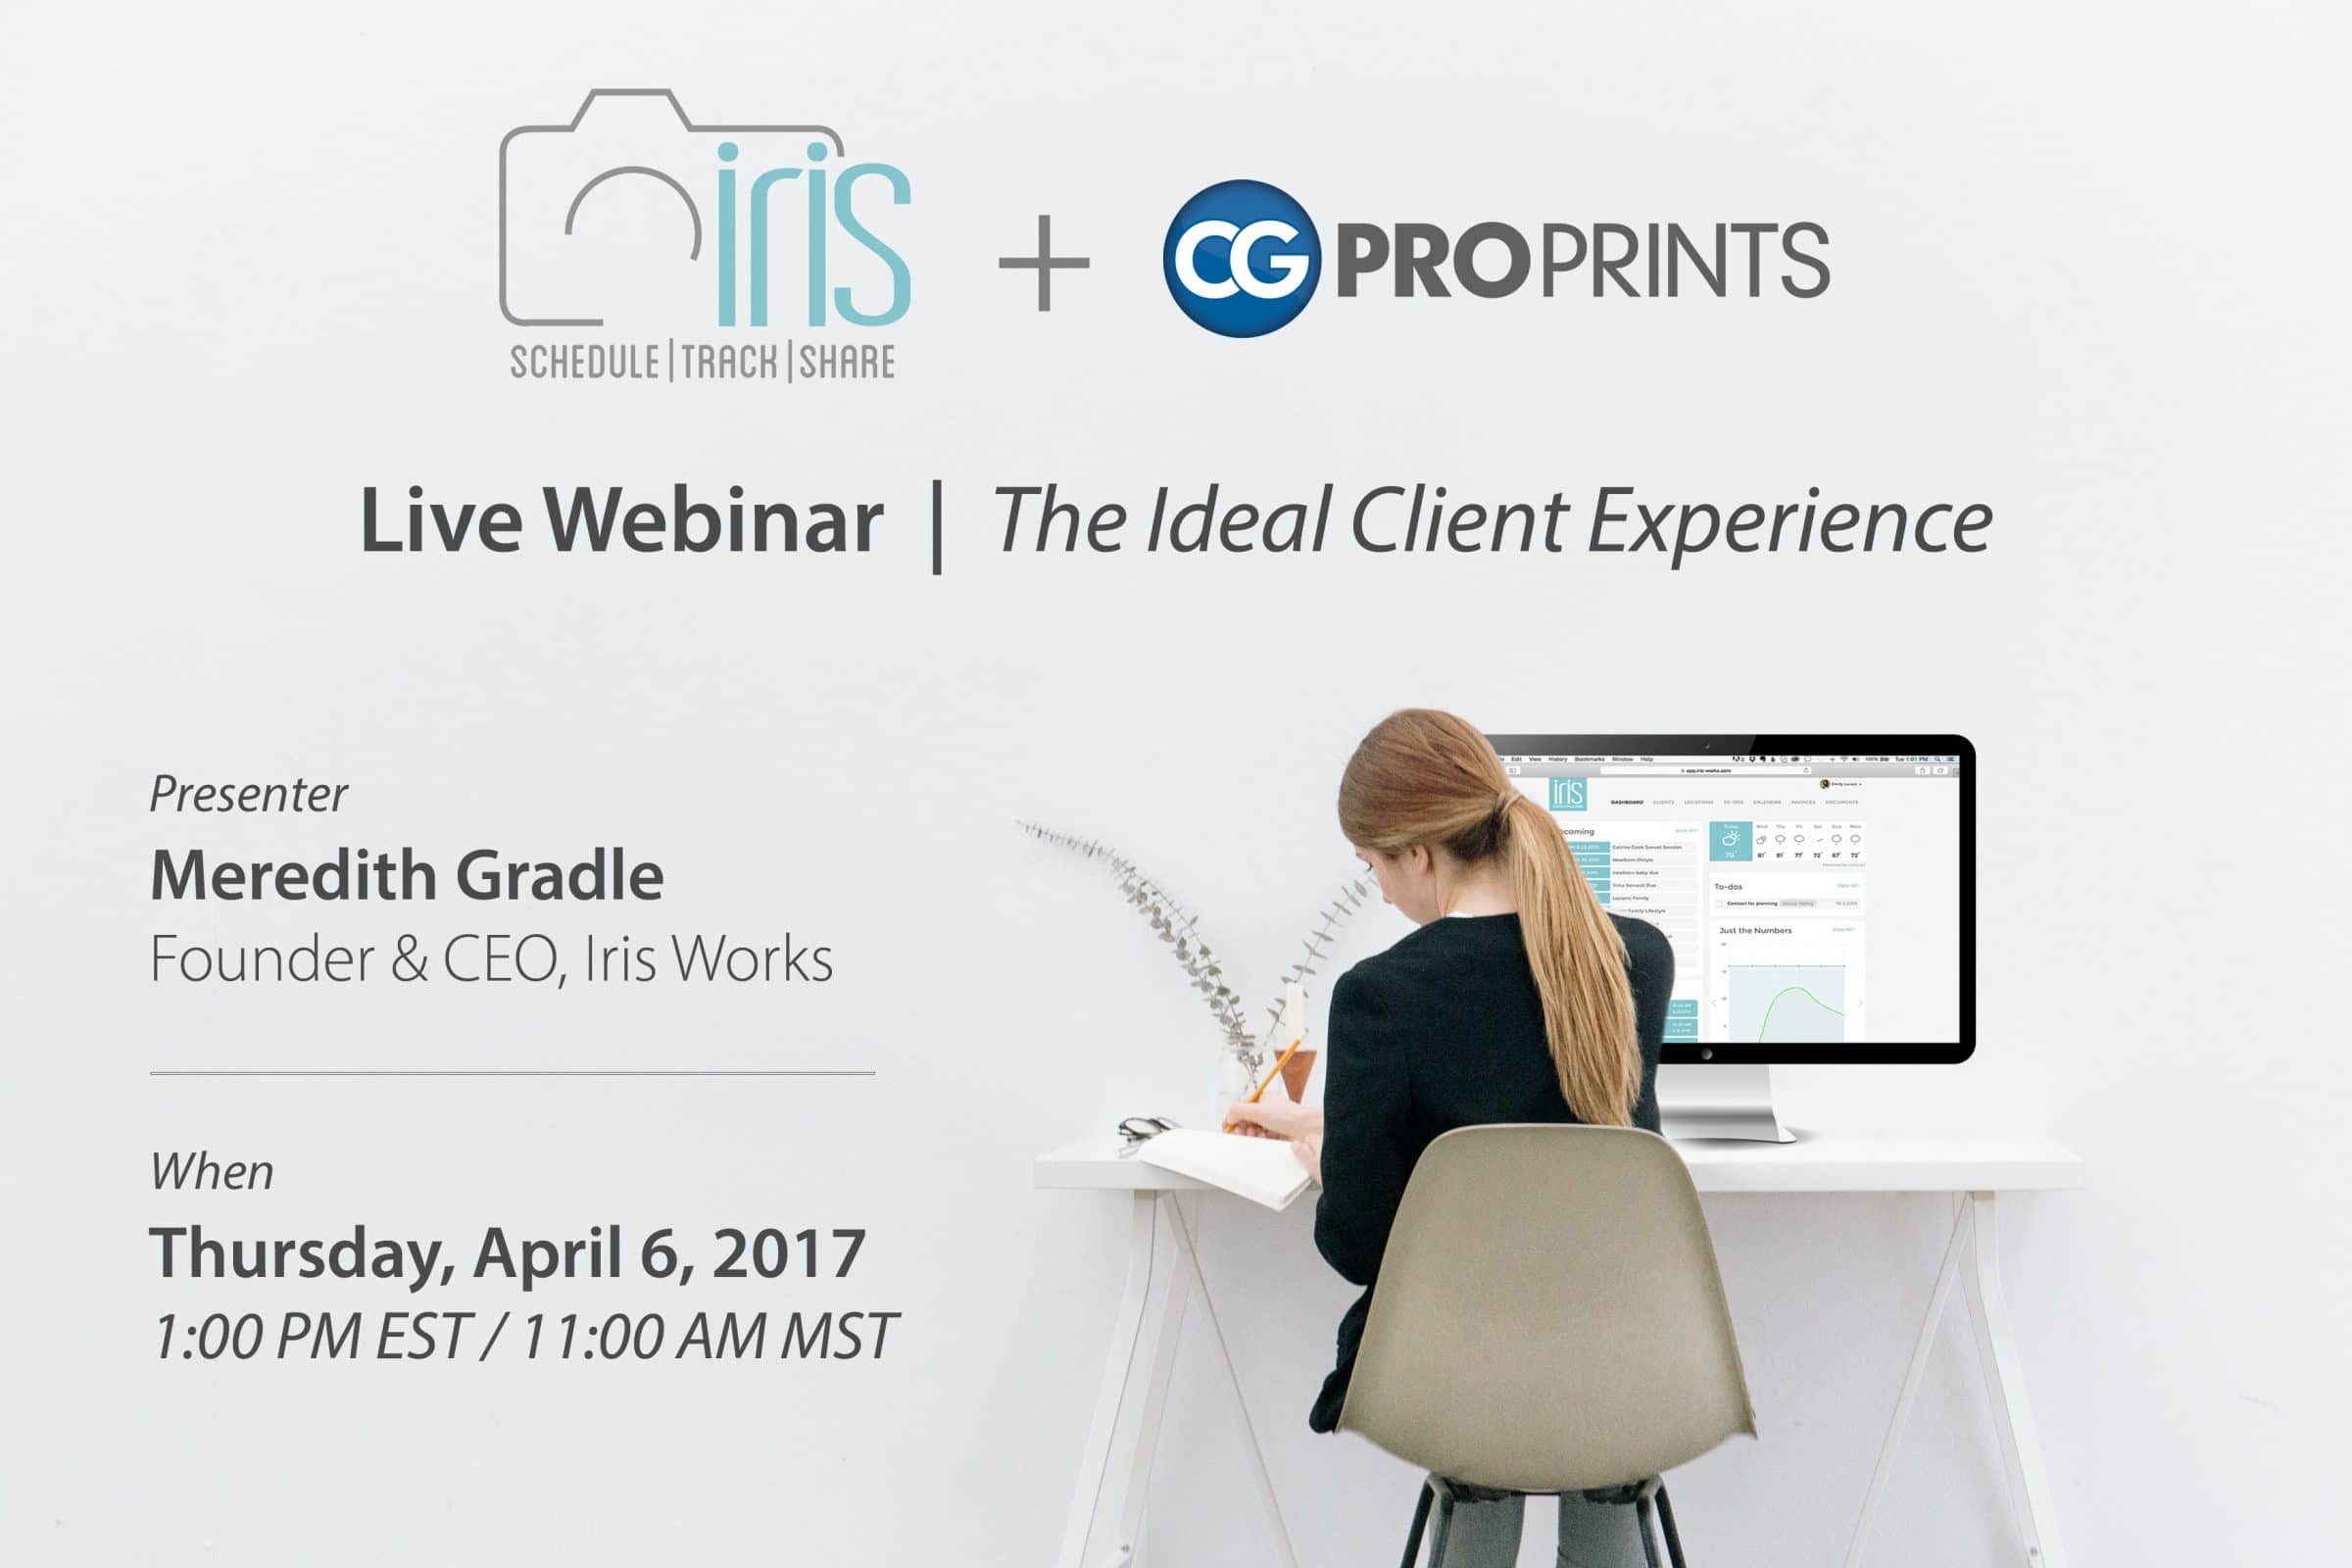 CG Pro Prints + Iris Works Webinar